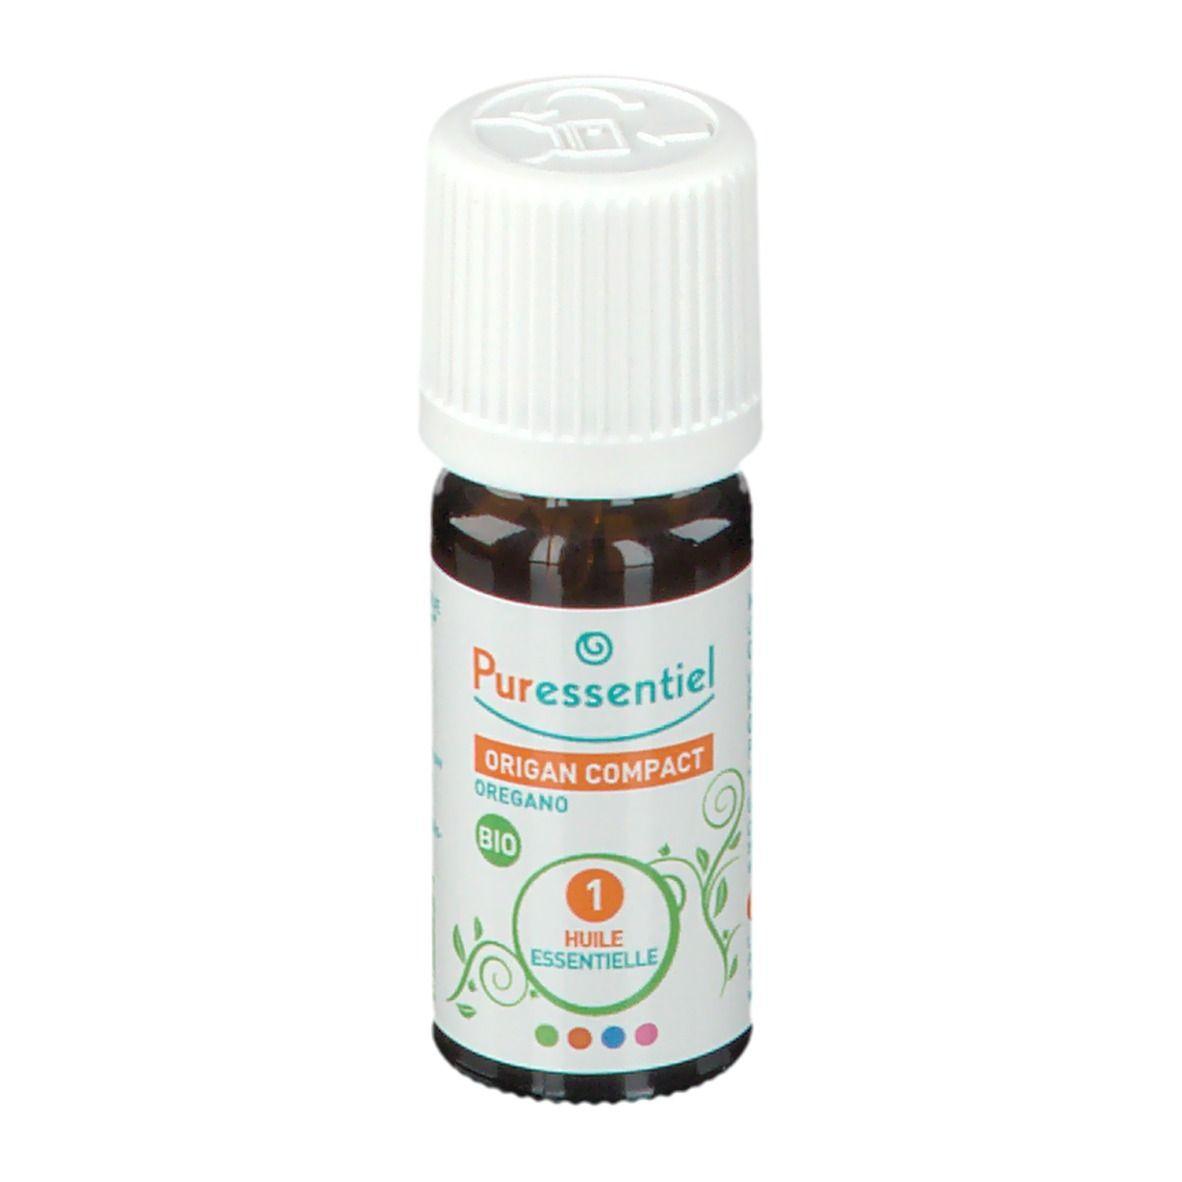 Puressentiel Huile Essentielle Origan Compact Bio ml huile